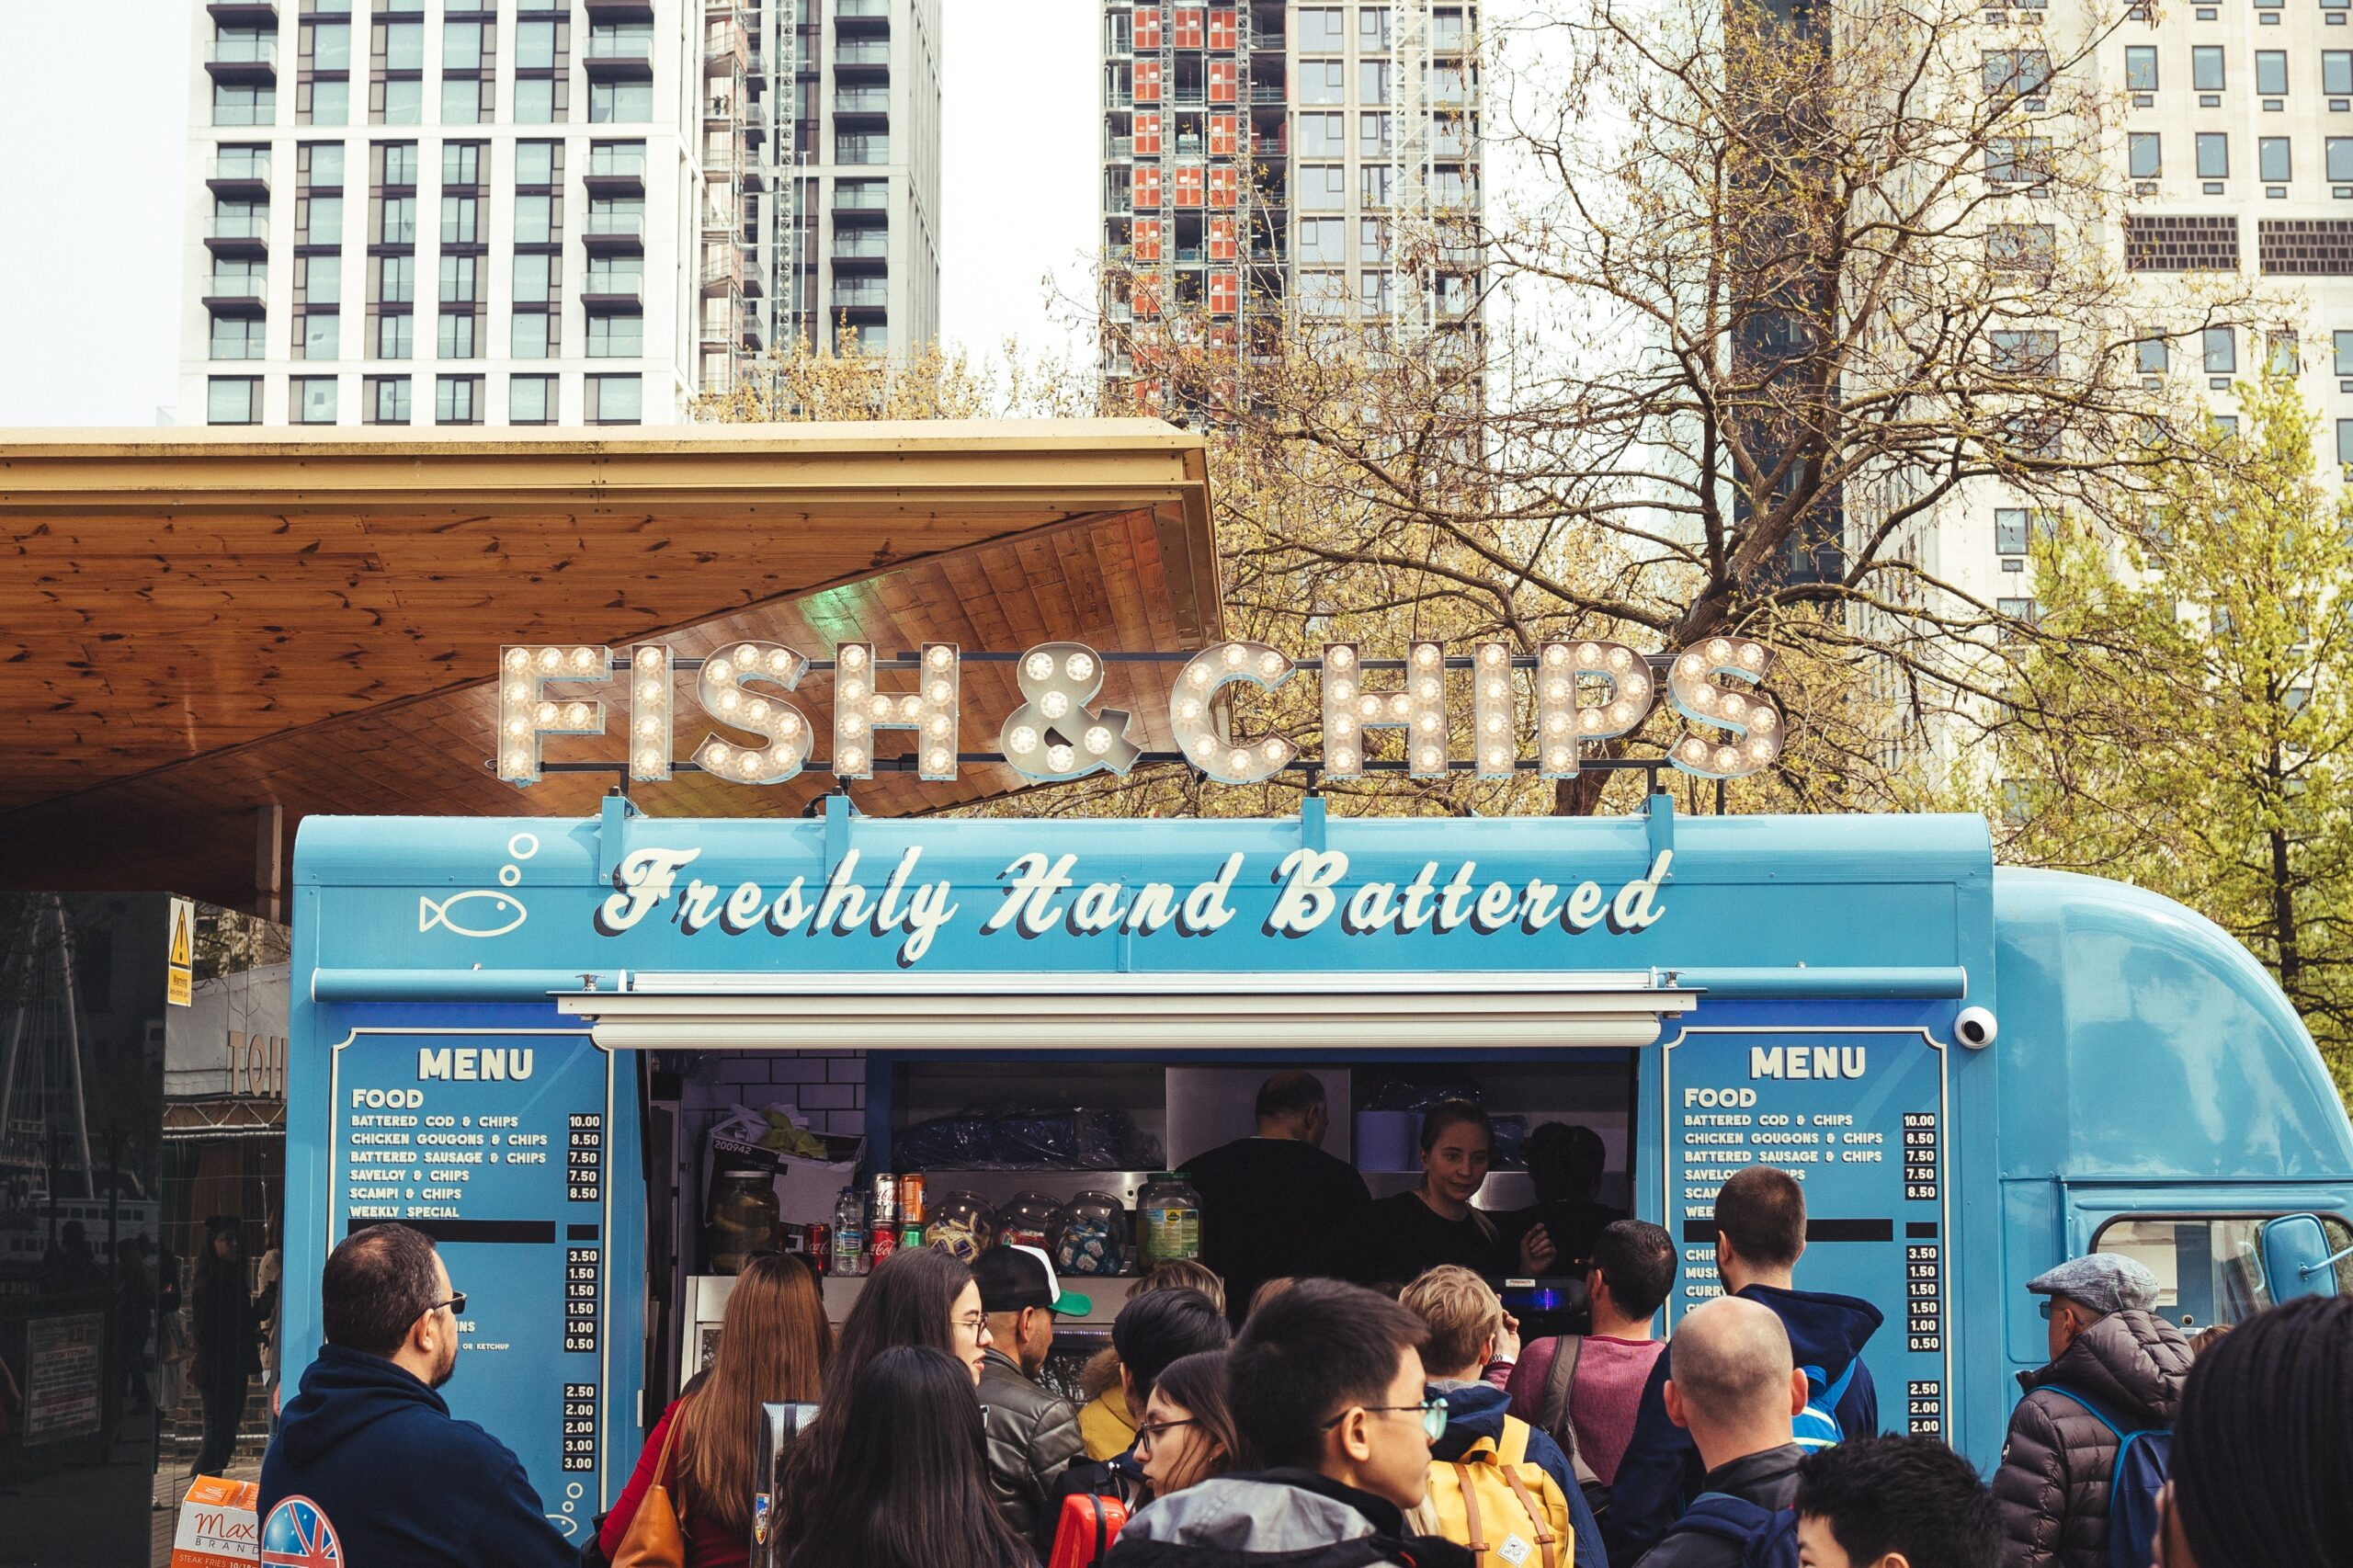 food truck business in UAE free zone